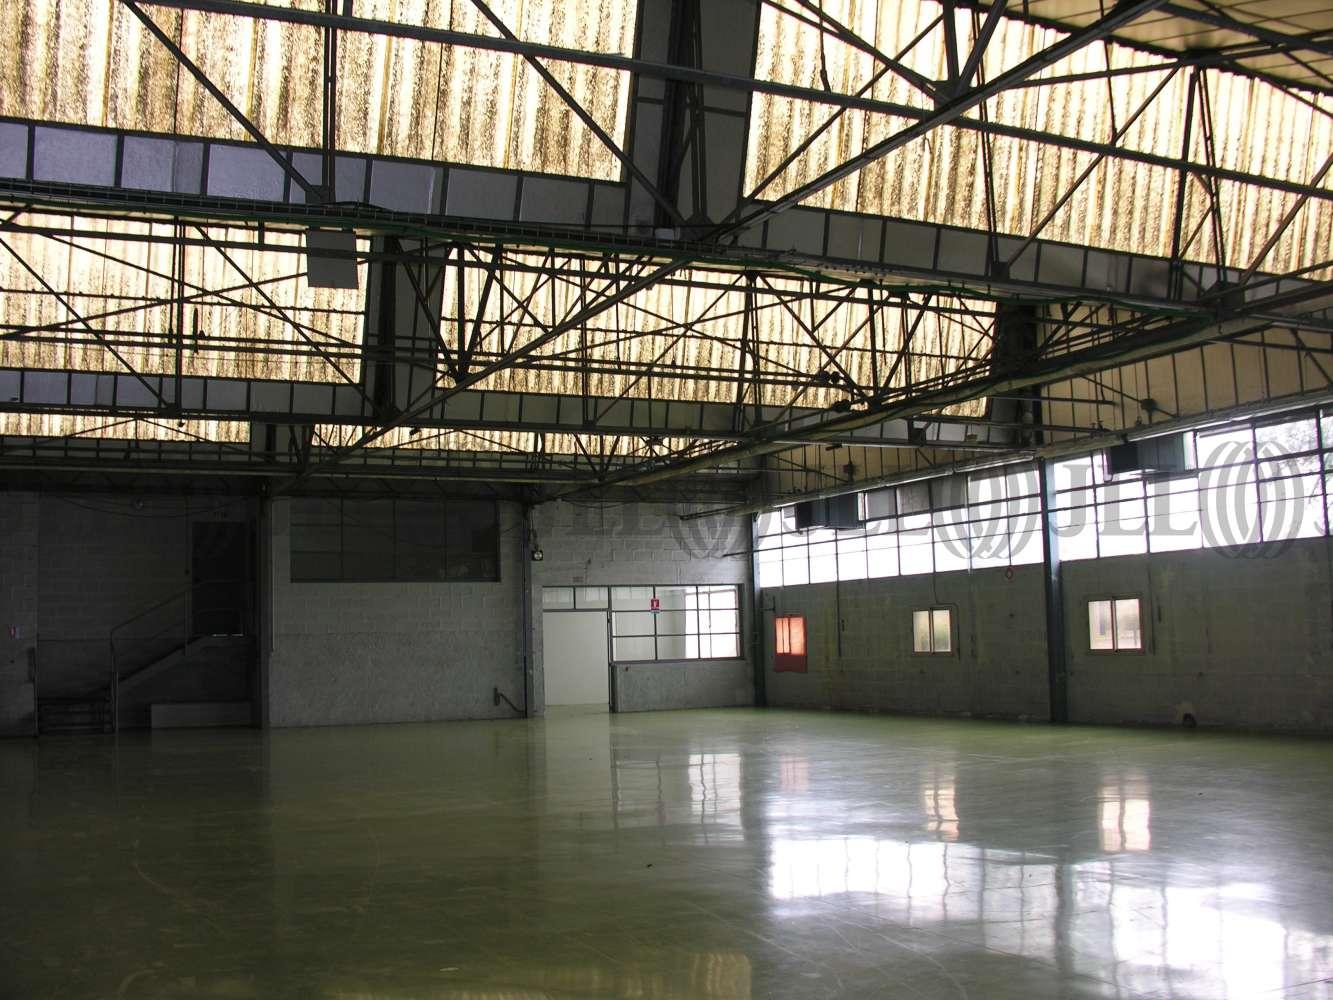 Activités/entrepôt Reims, 51100 - 8 RUE ANDRÉ HUET - 488662